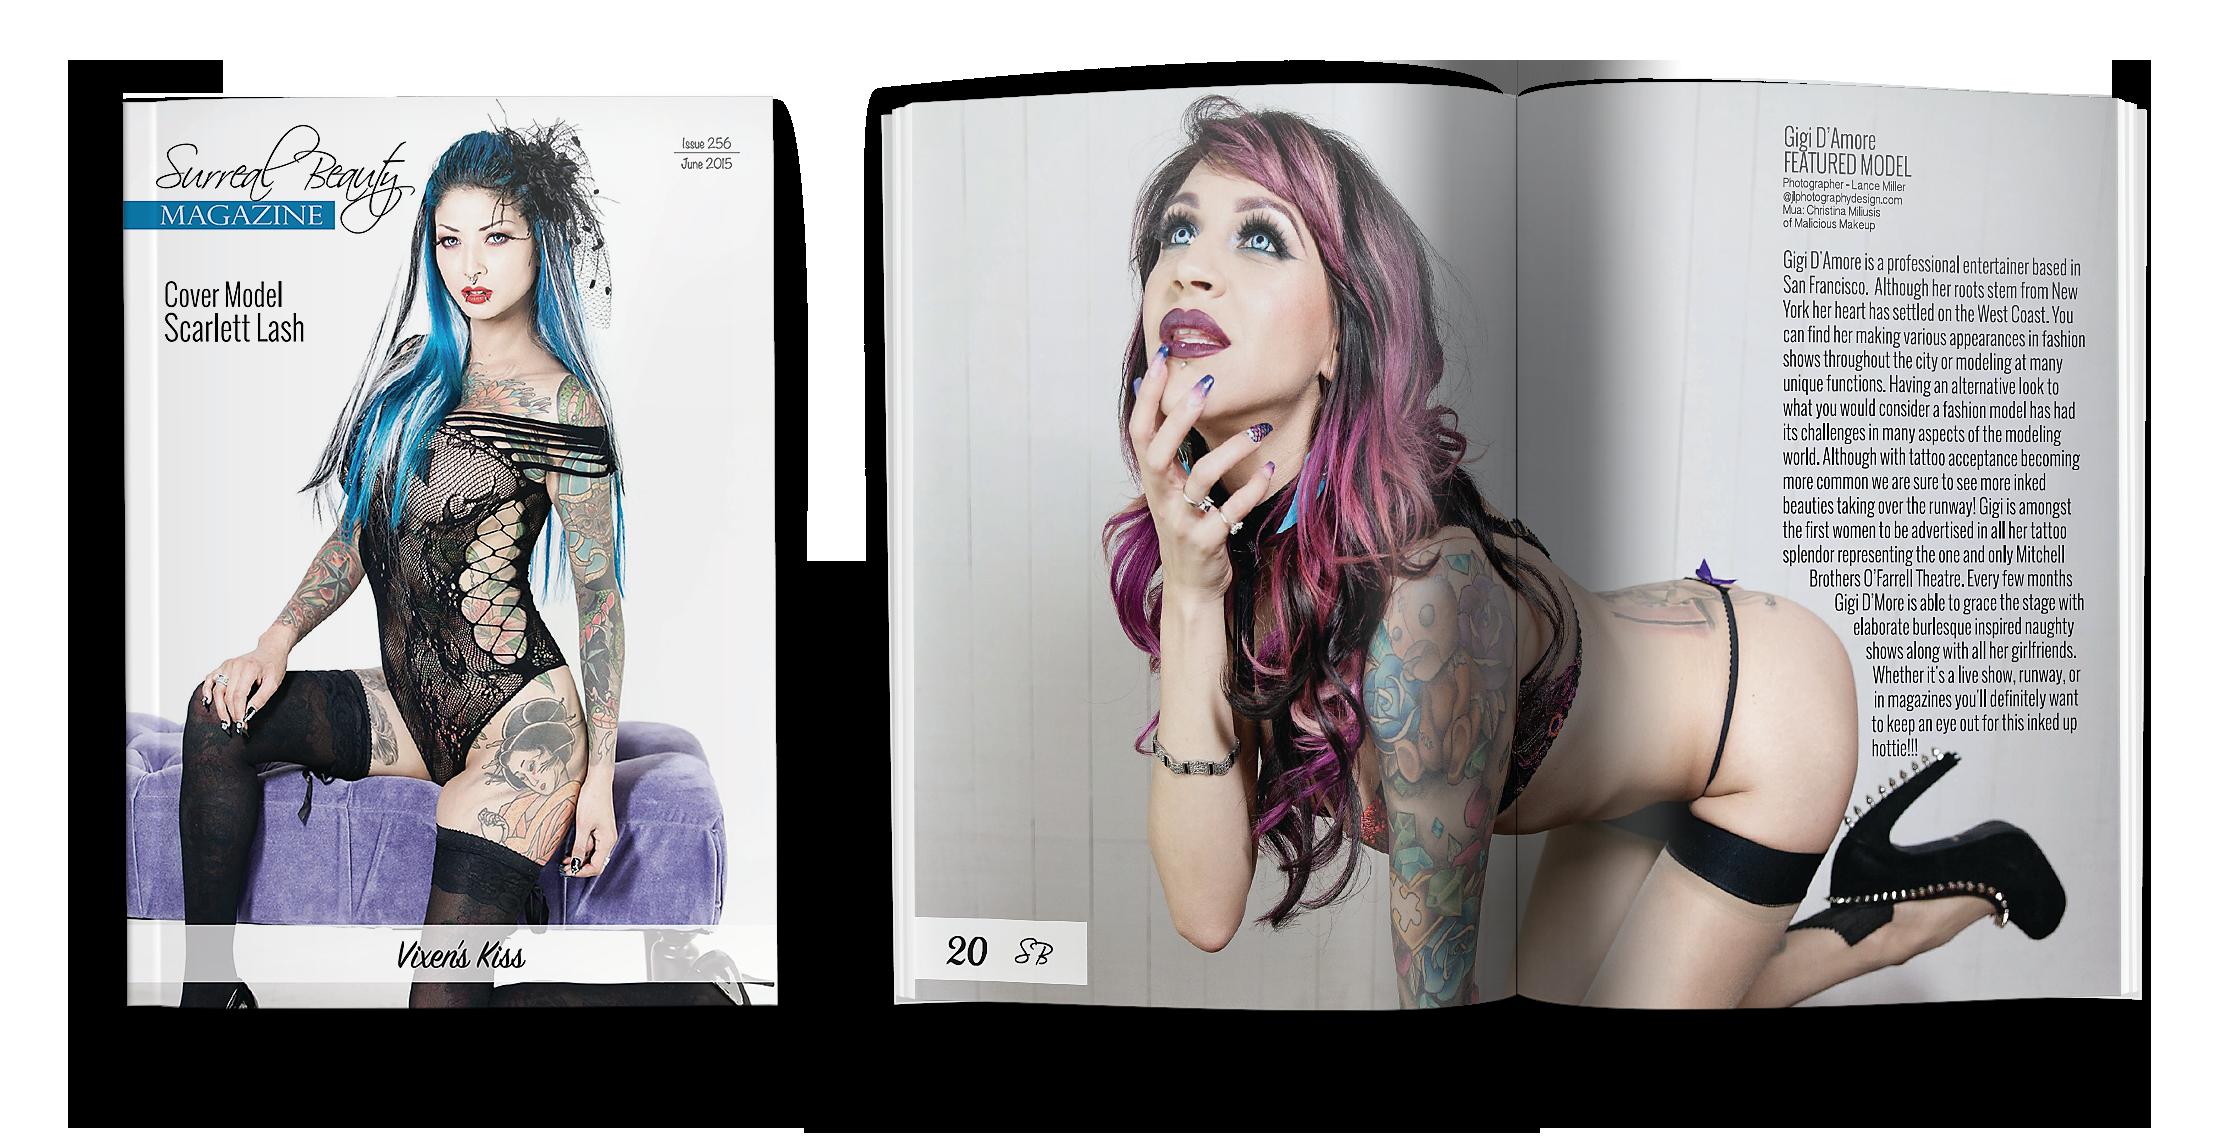 Surreal_Beauty_Magazine_Vixen_s_Kiss_Render1.png